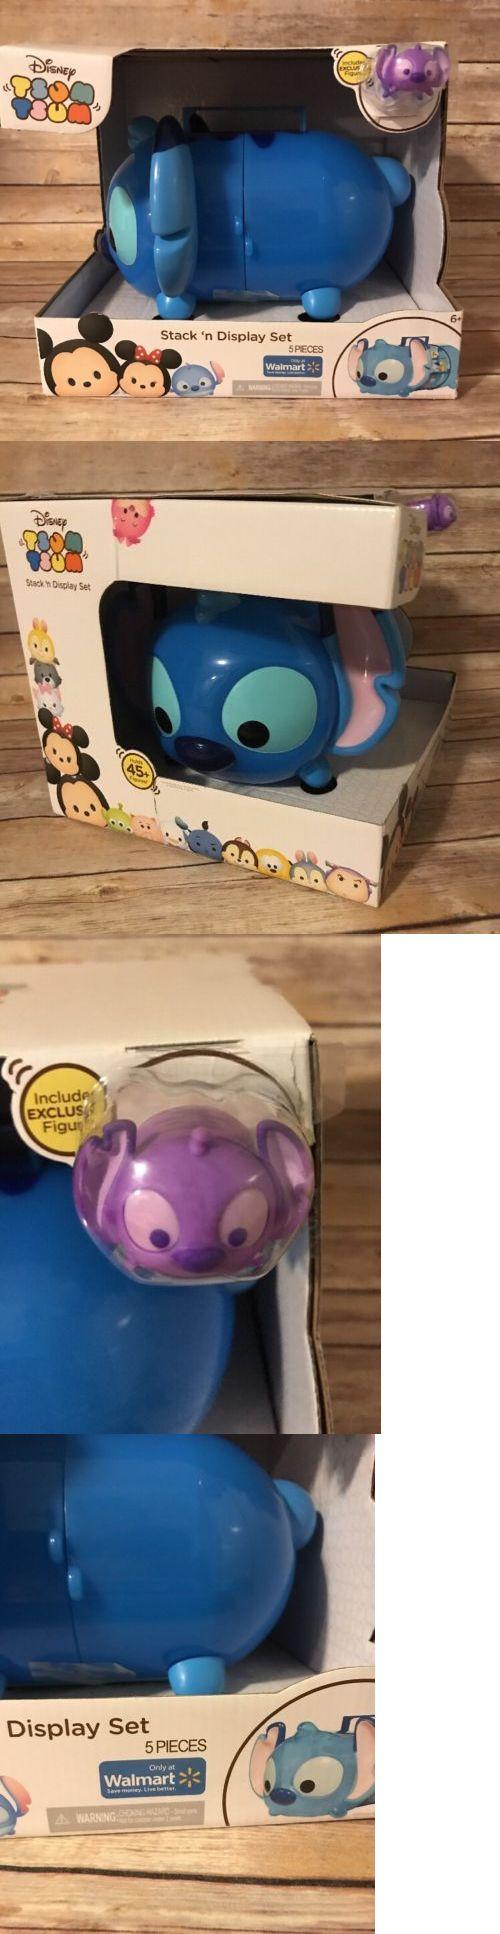 Other Disney Toys 19224: Disney Tsum Tsum Stack N Display Set Stitch Nib Walmart Exclusive Figure 5 Pcs -> BUY IT NOW ONLY: $60 on eBay!